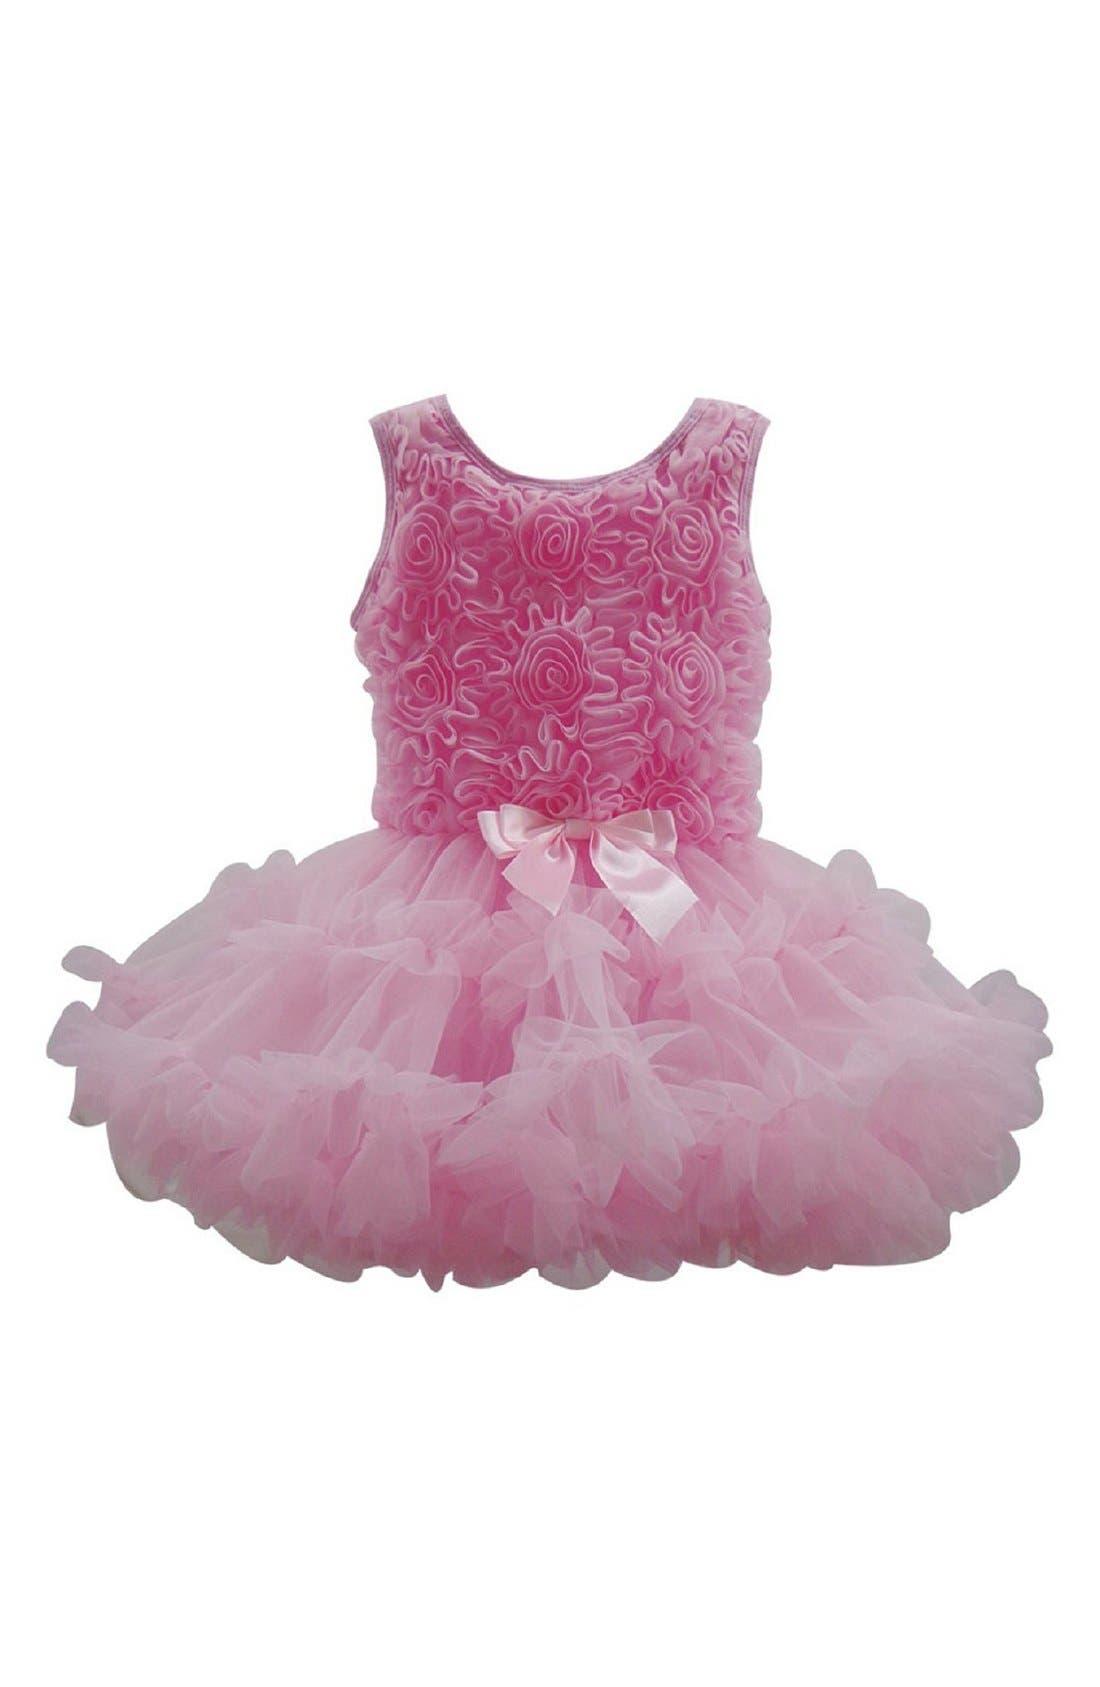 Alternate Image 1 Selected - Popatu Rosette Soutache Pettidress (Toddler Girls & Little Girls)